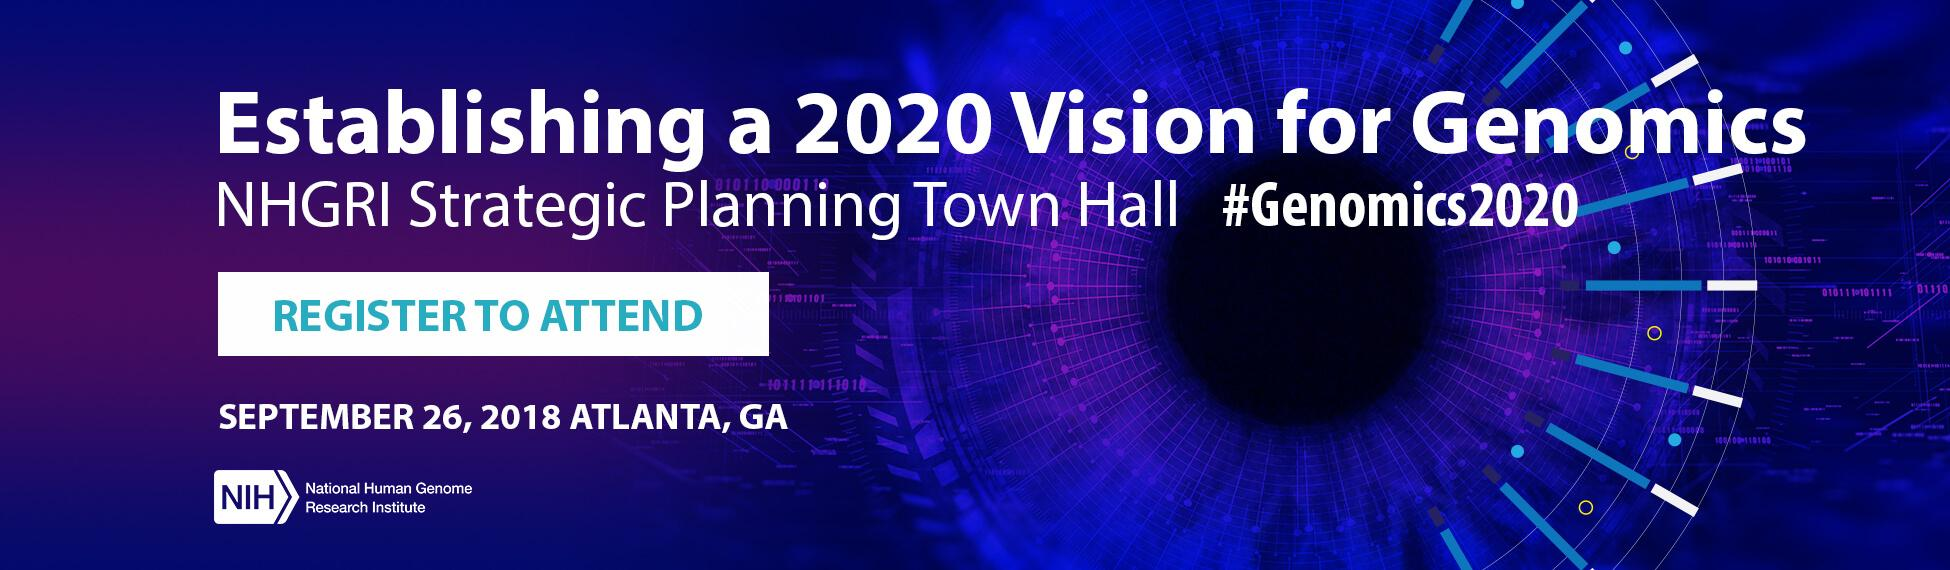 Establishing a 2020 Vision for Genomics: Register to attend